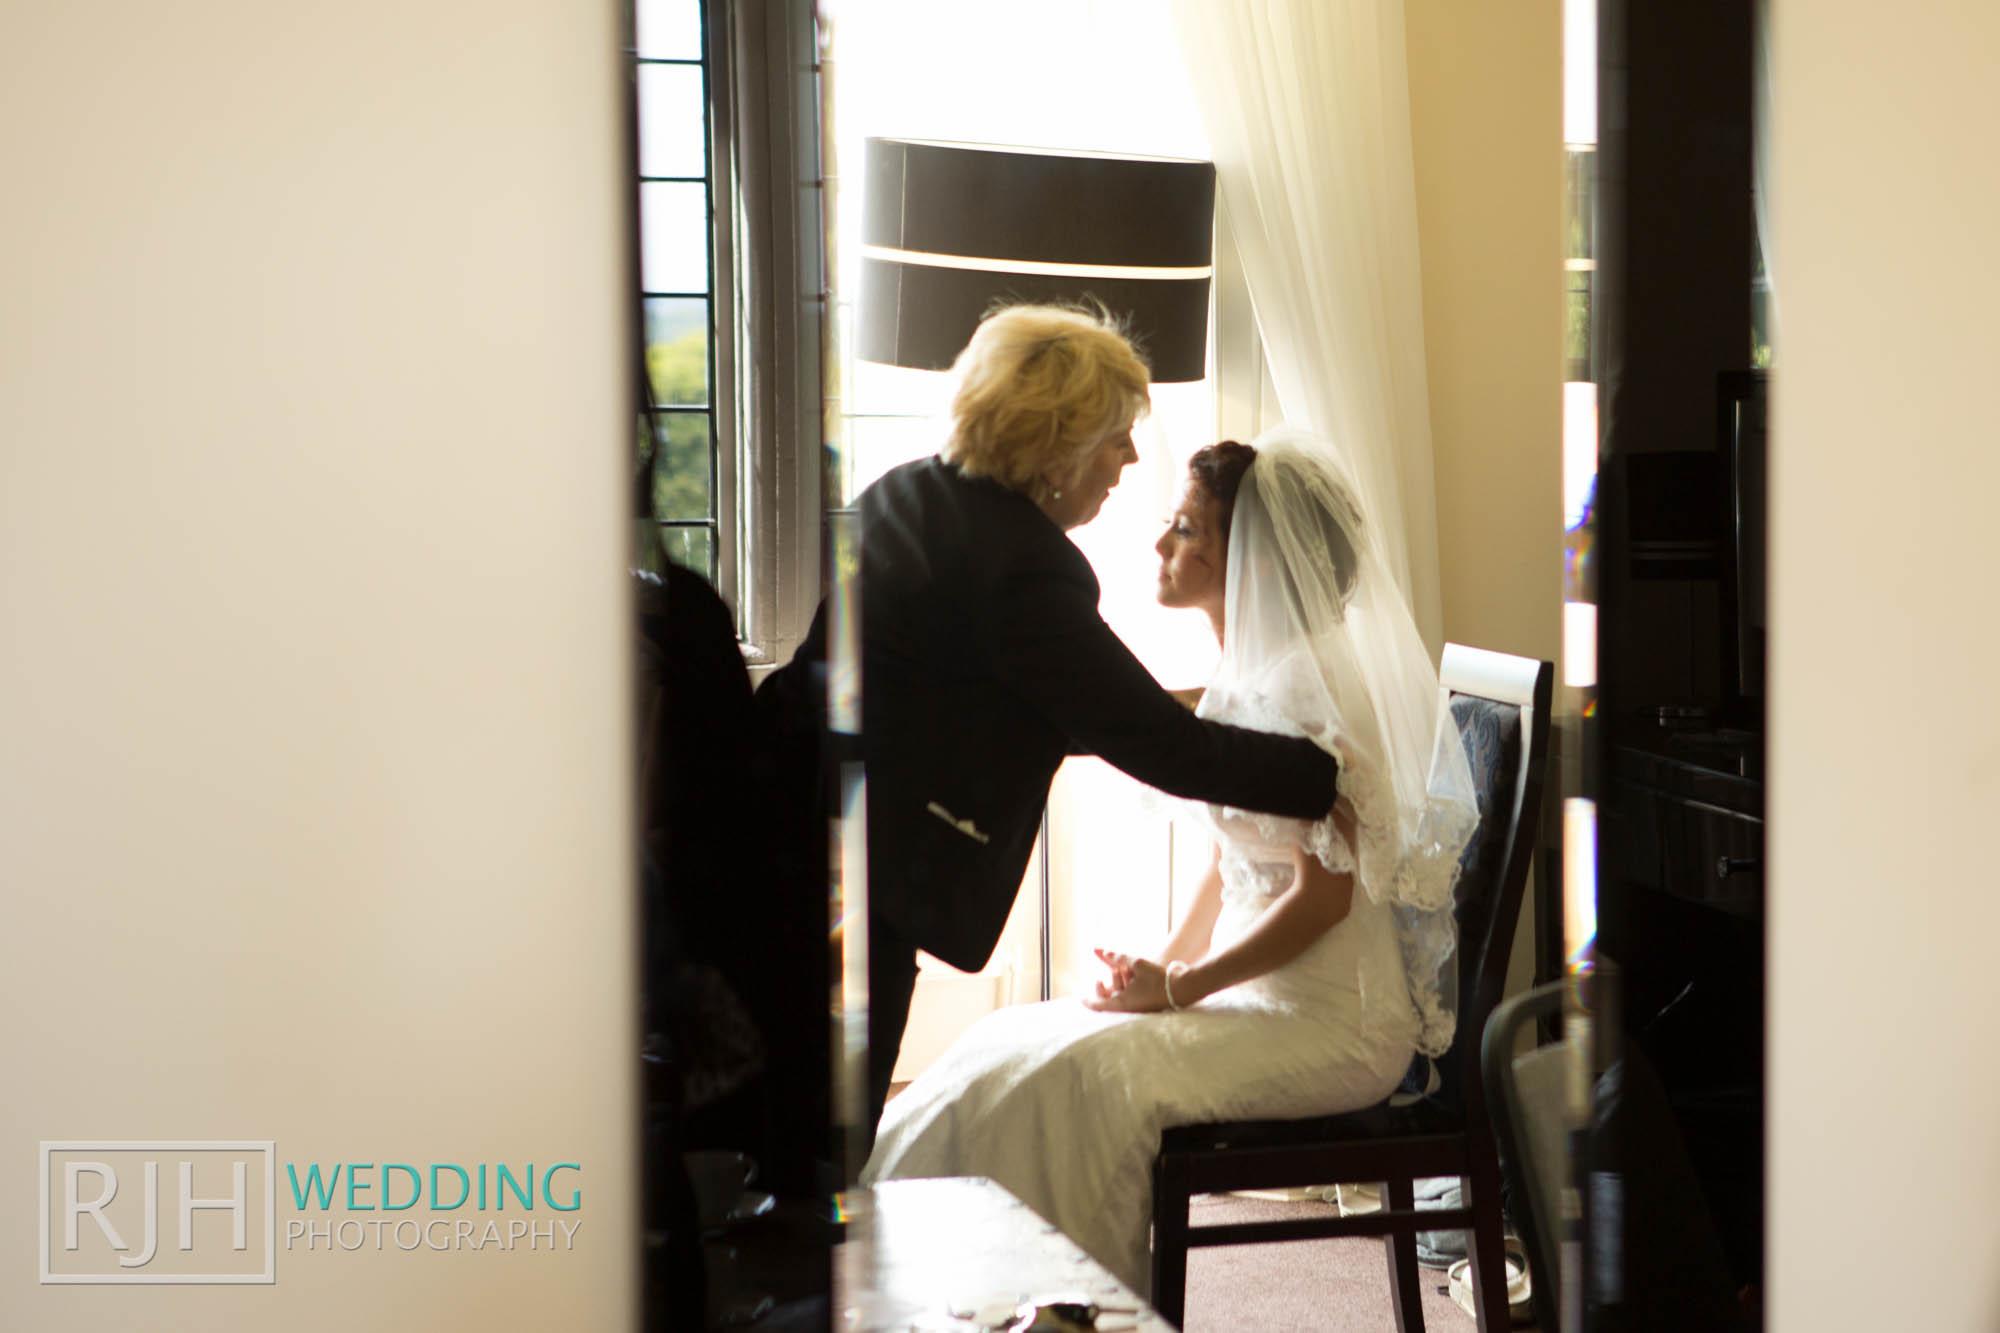 Whitley Hall Marples Wedding_116_3C2A8581.jpg